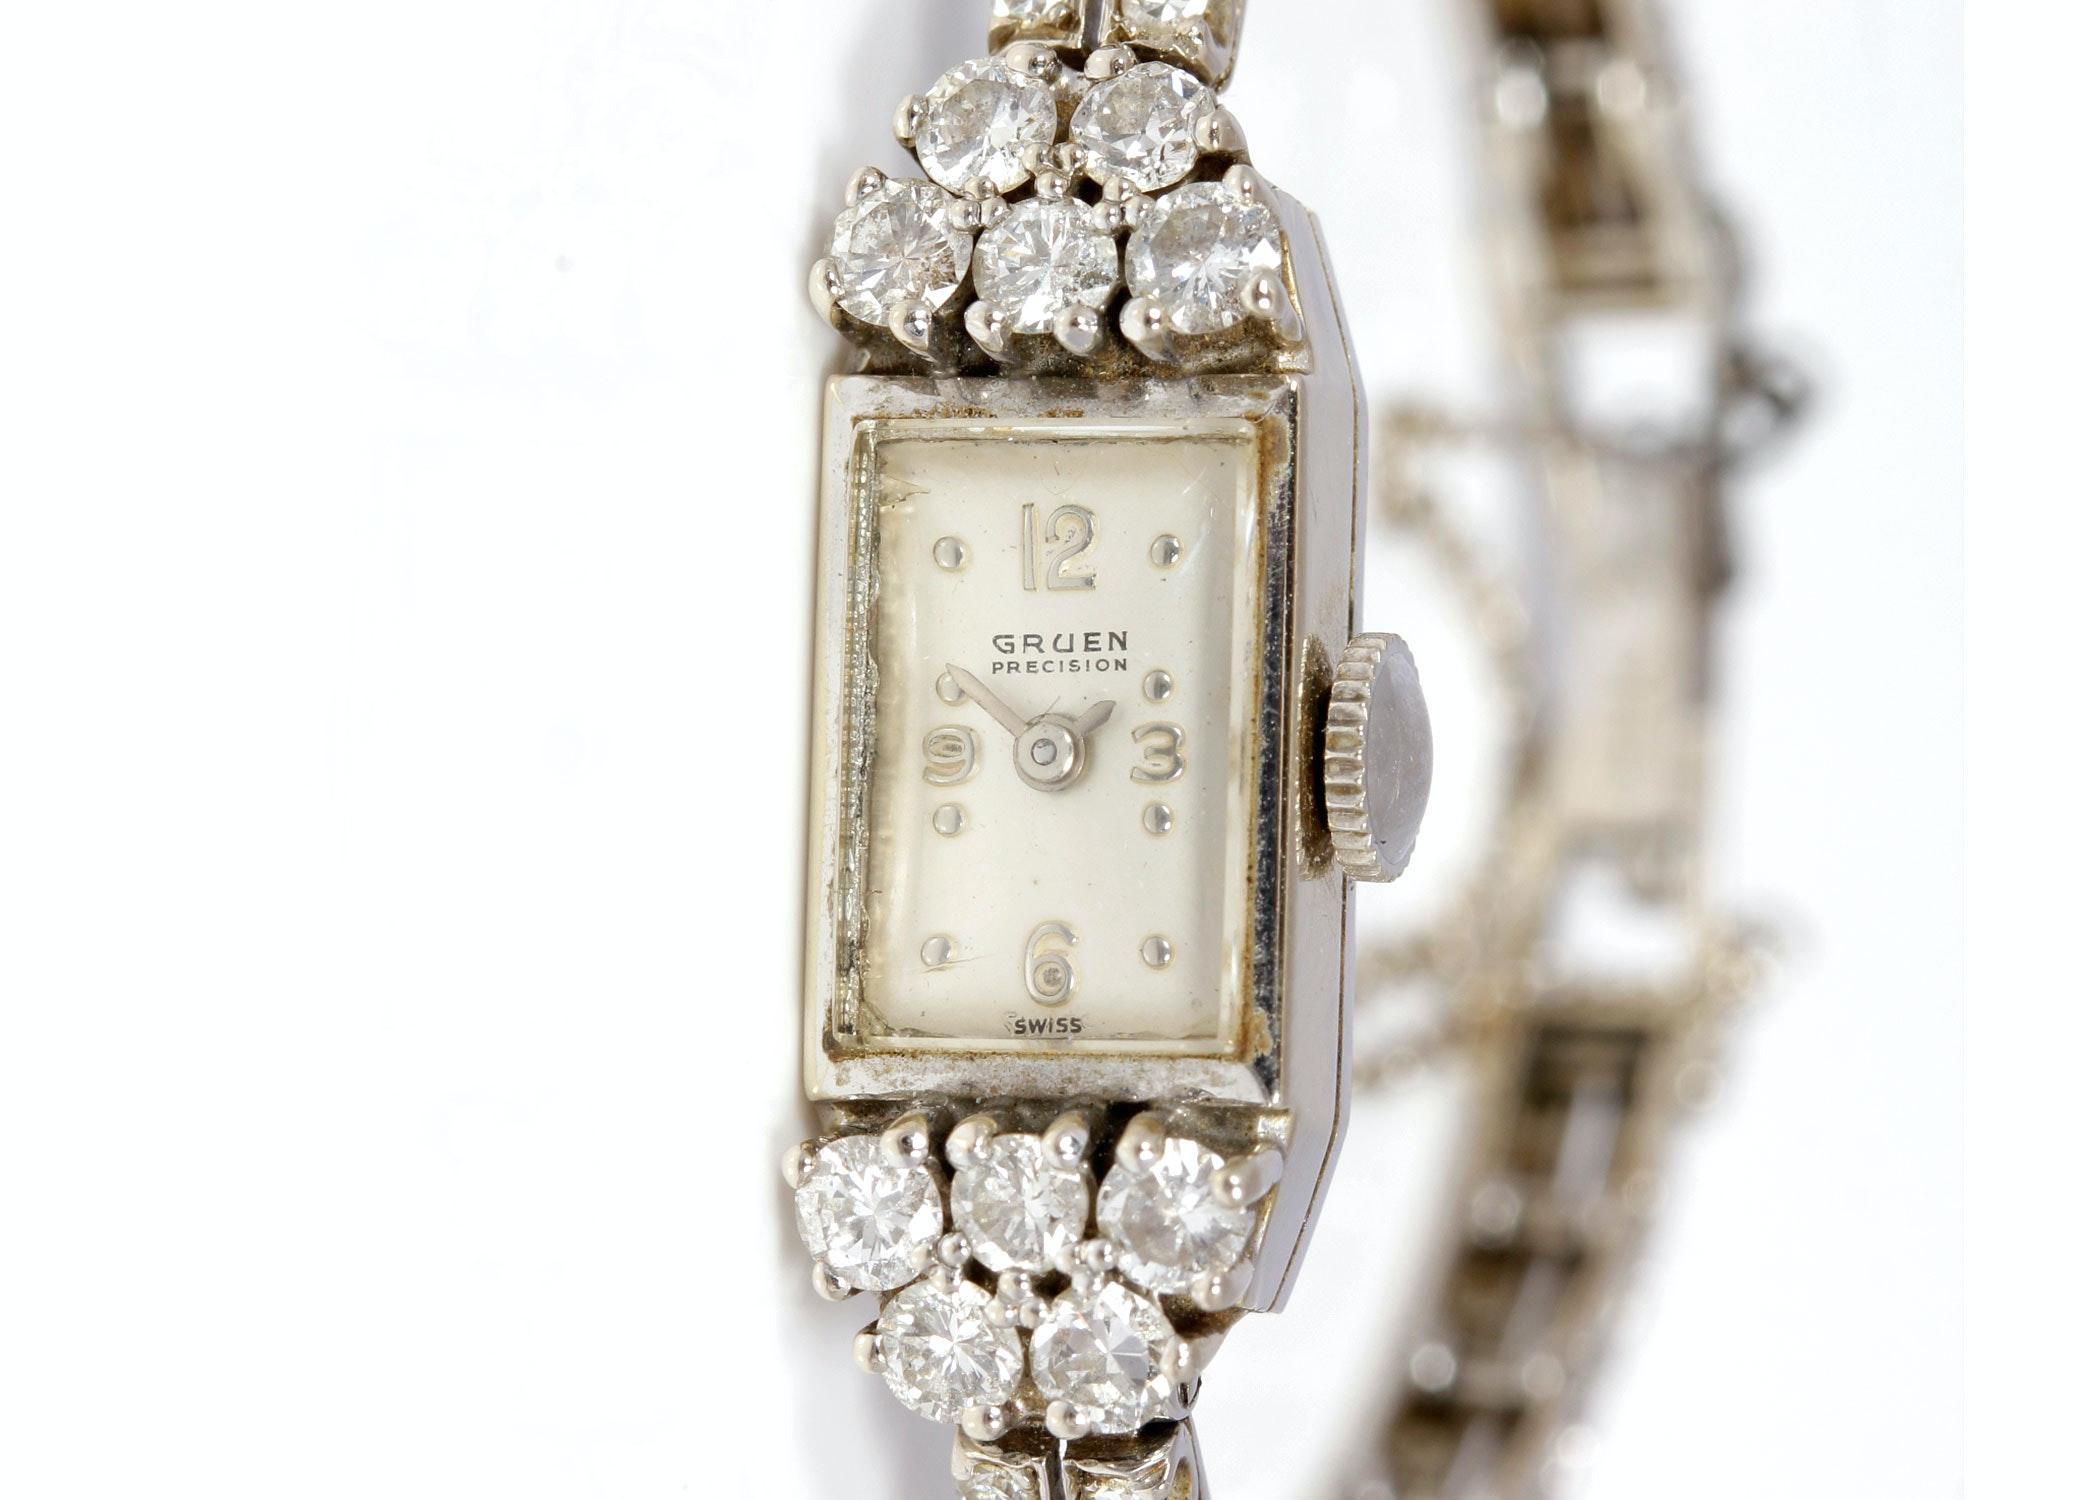 14K White Gold and Diamond Gruen Precision Women's Wristwatch